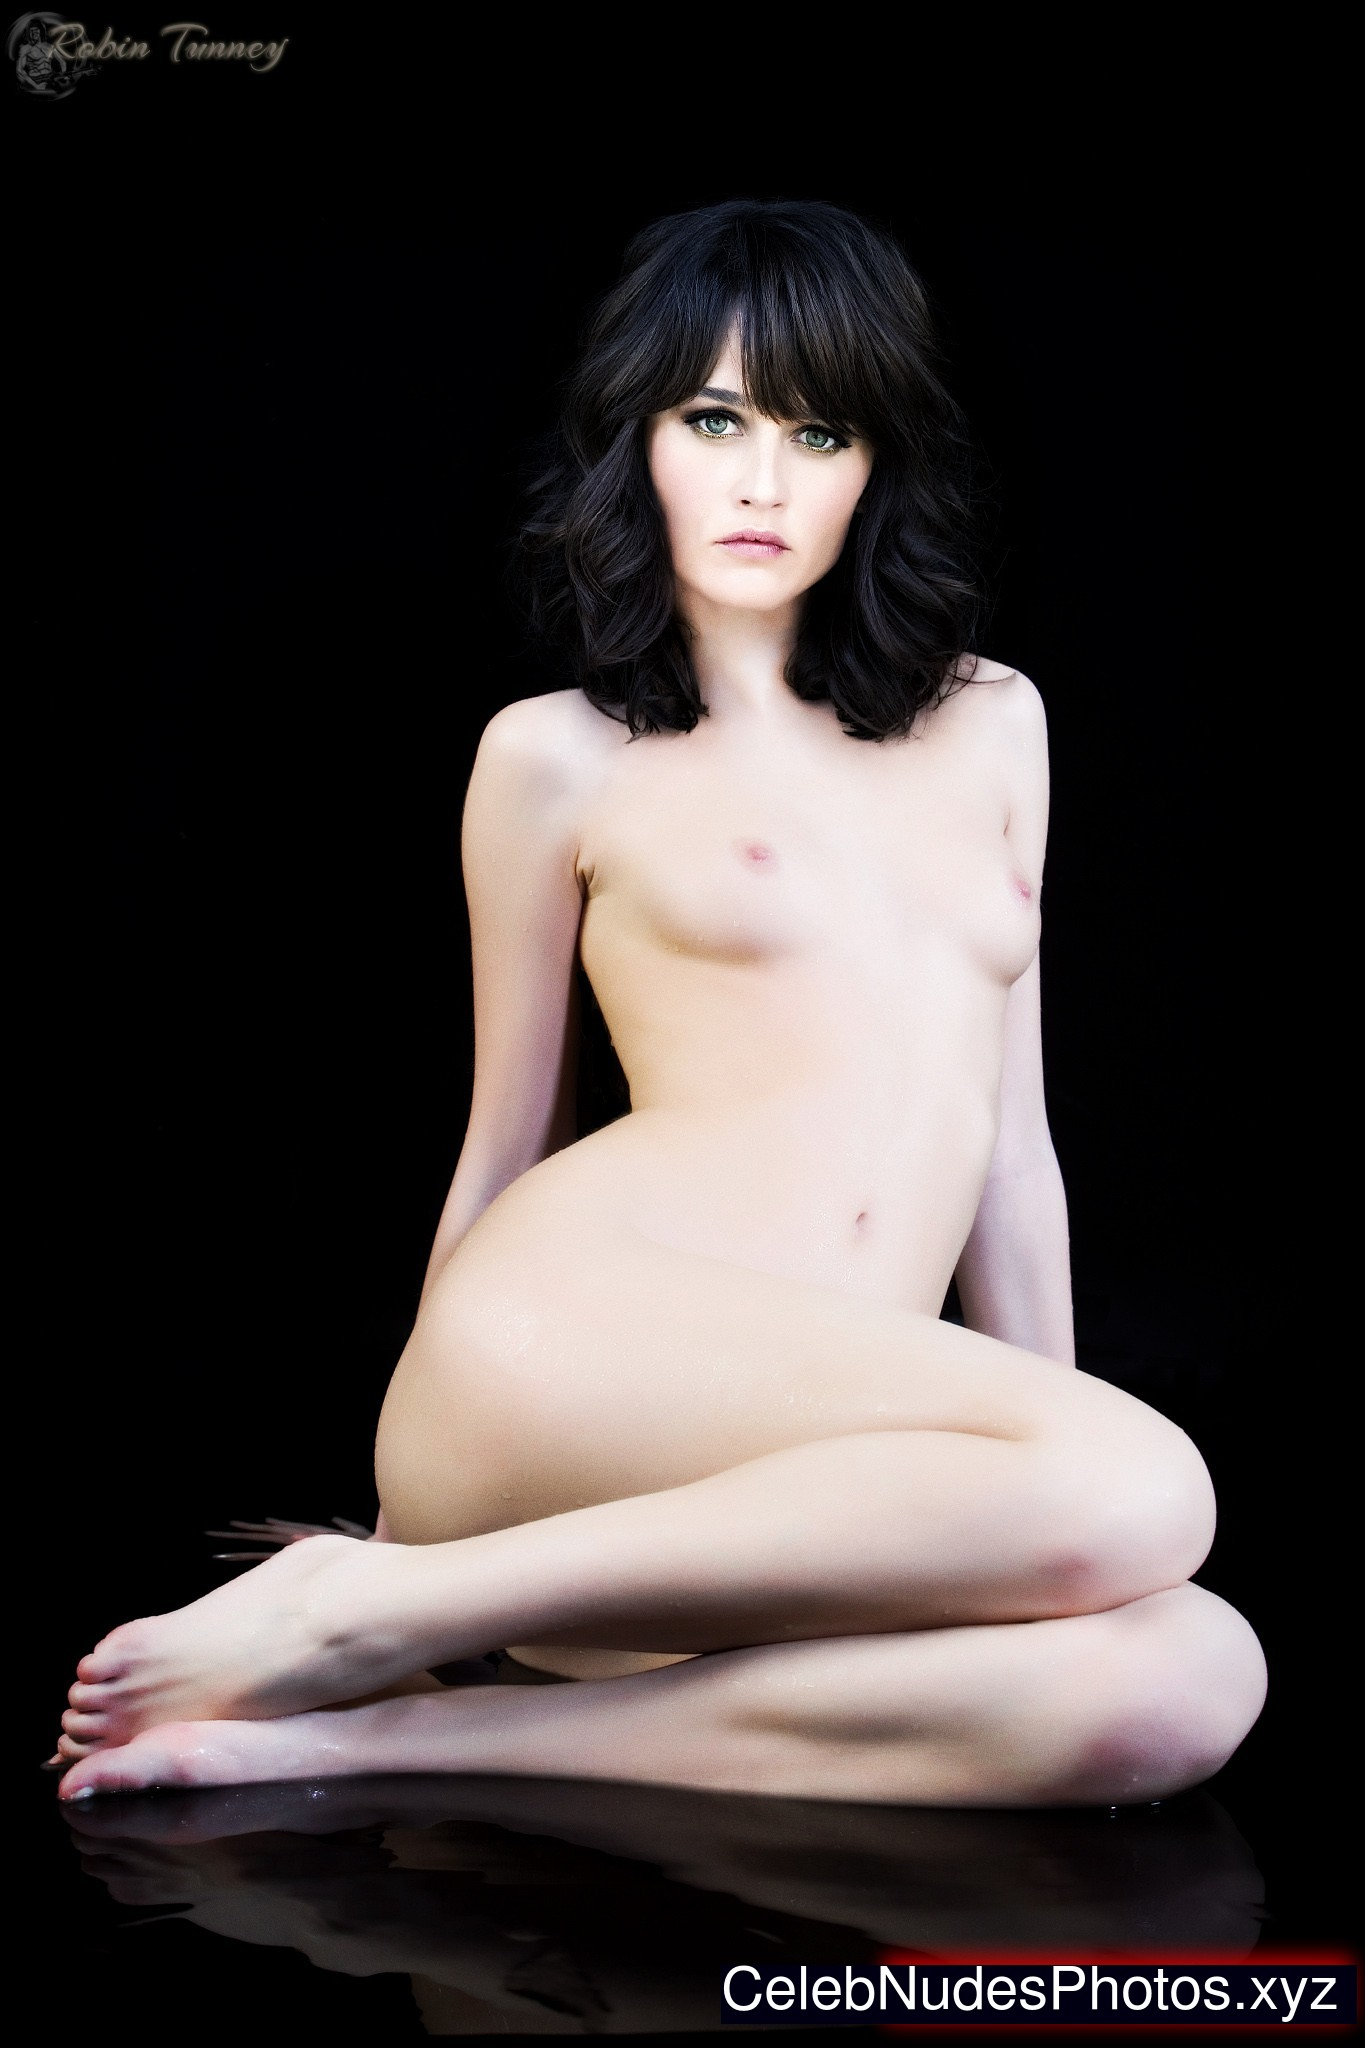 robin tunney naked pics free